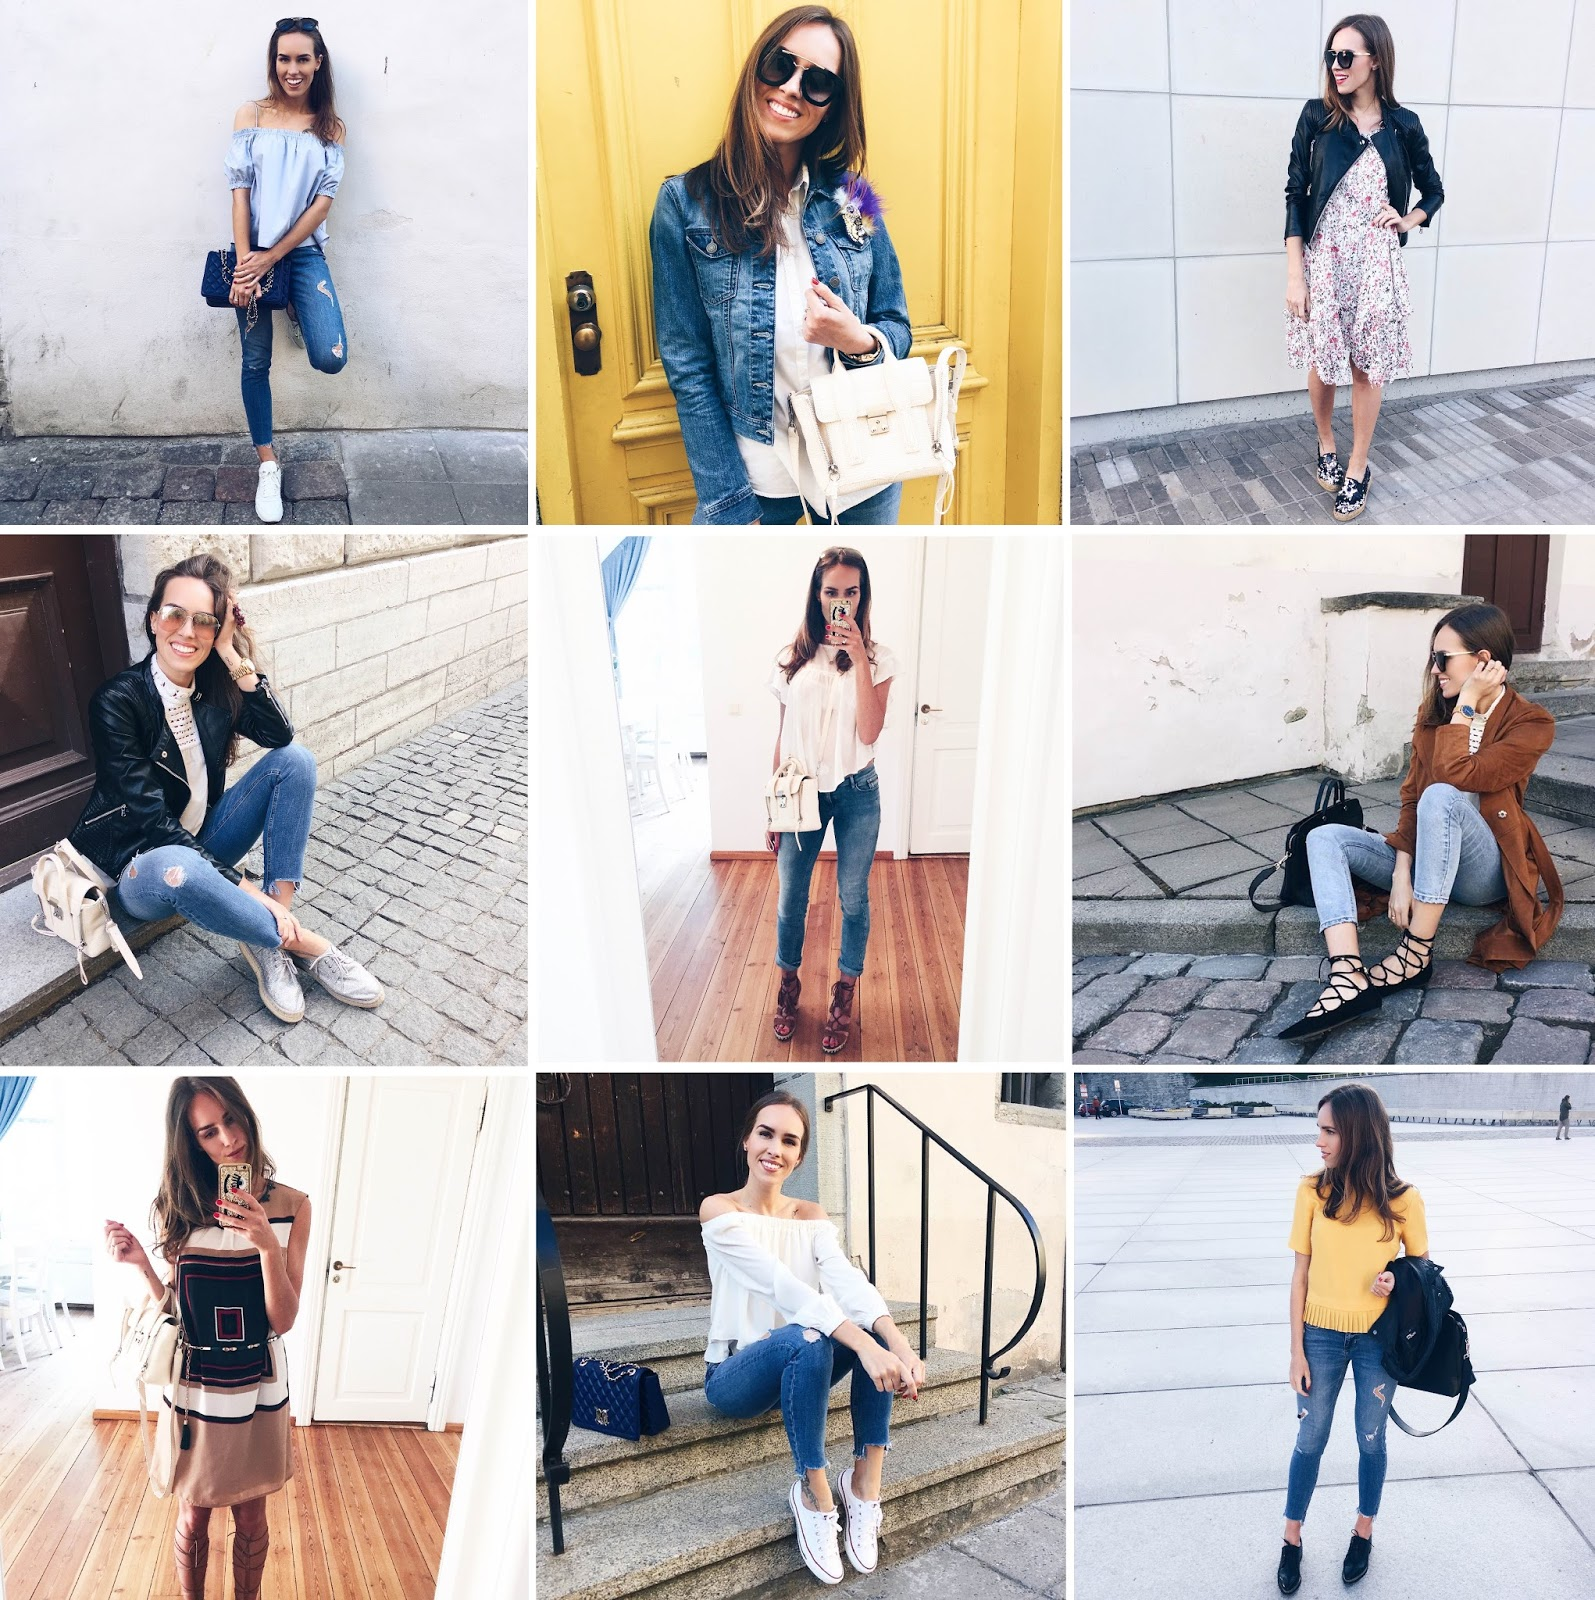 kristjaana instagram outfits